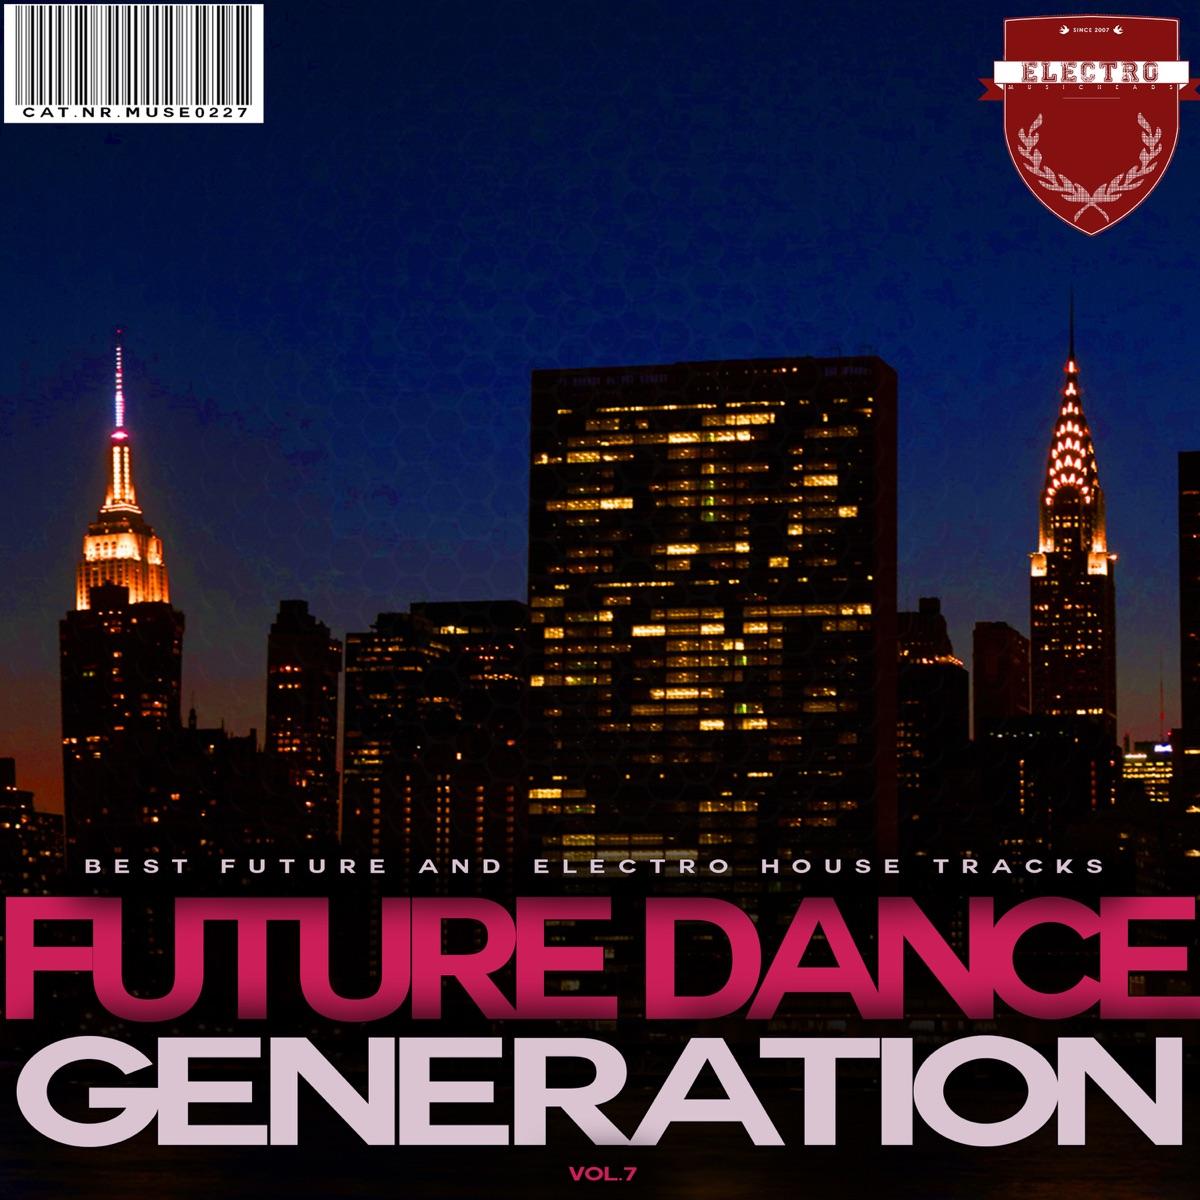 Future Dance Generation Vol 7 Various Artists CD cover